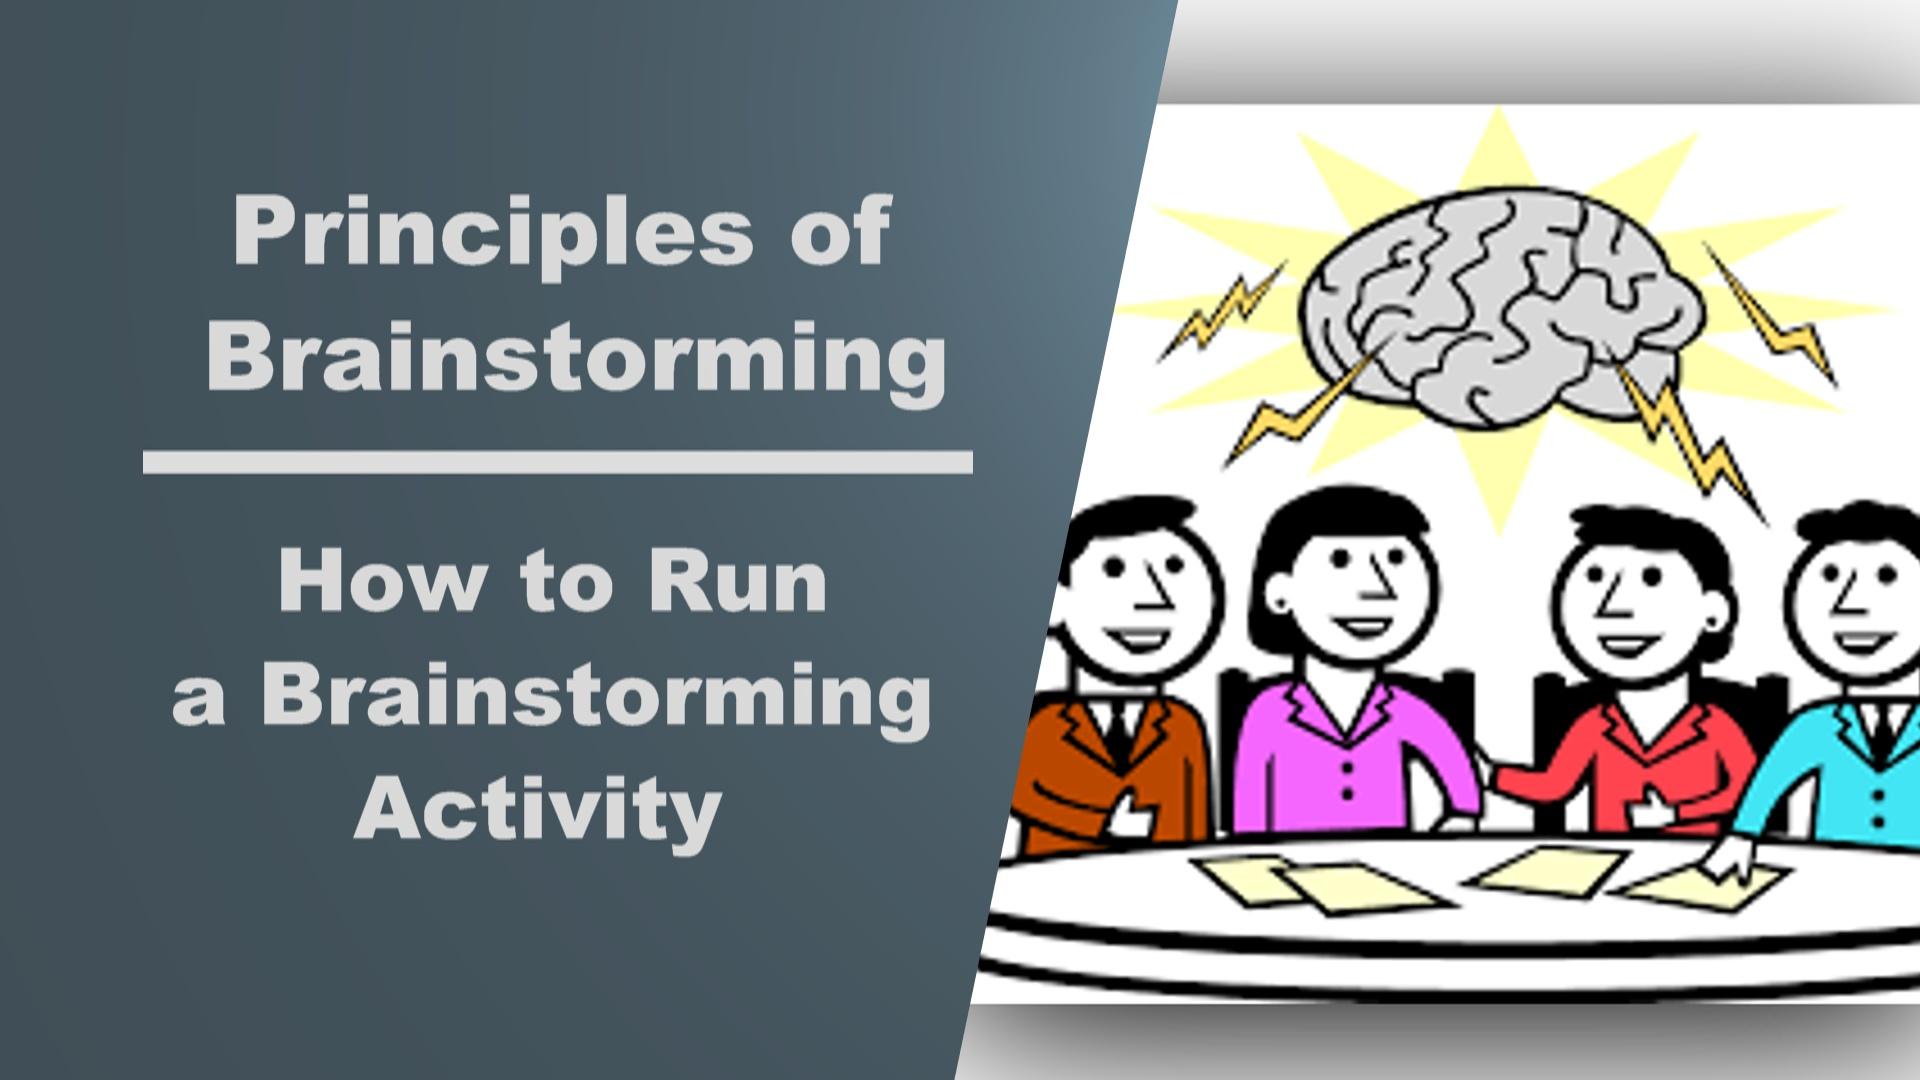 The Principles Of Brainstorming